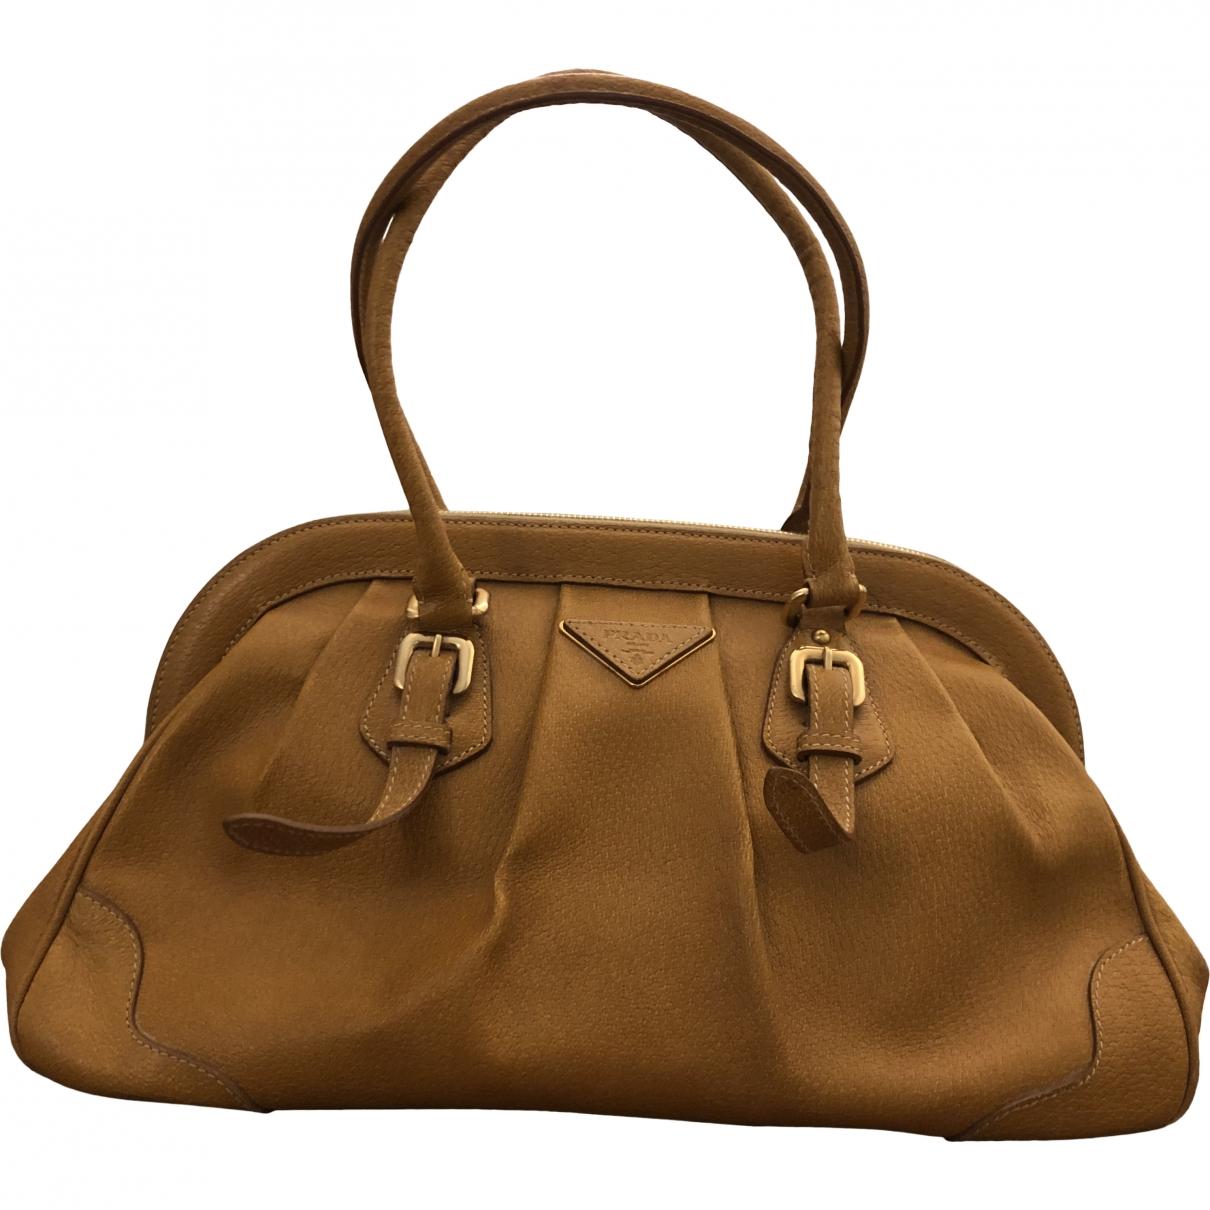 Prada \N Camel Leather handbag for Women \N